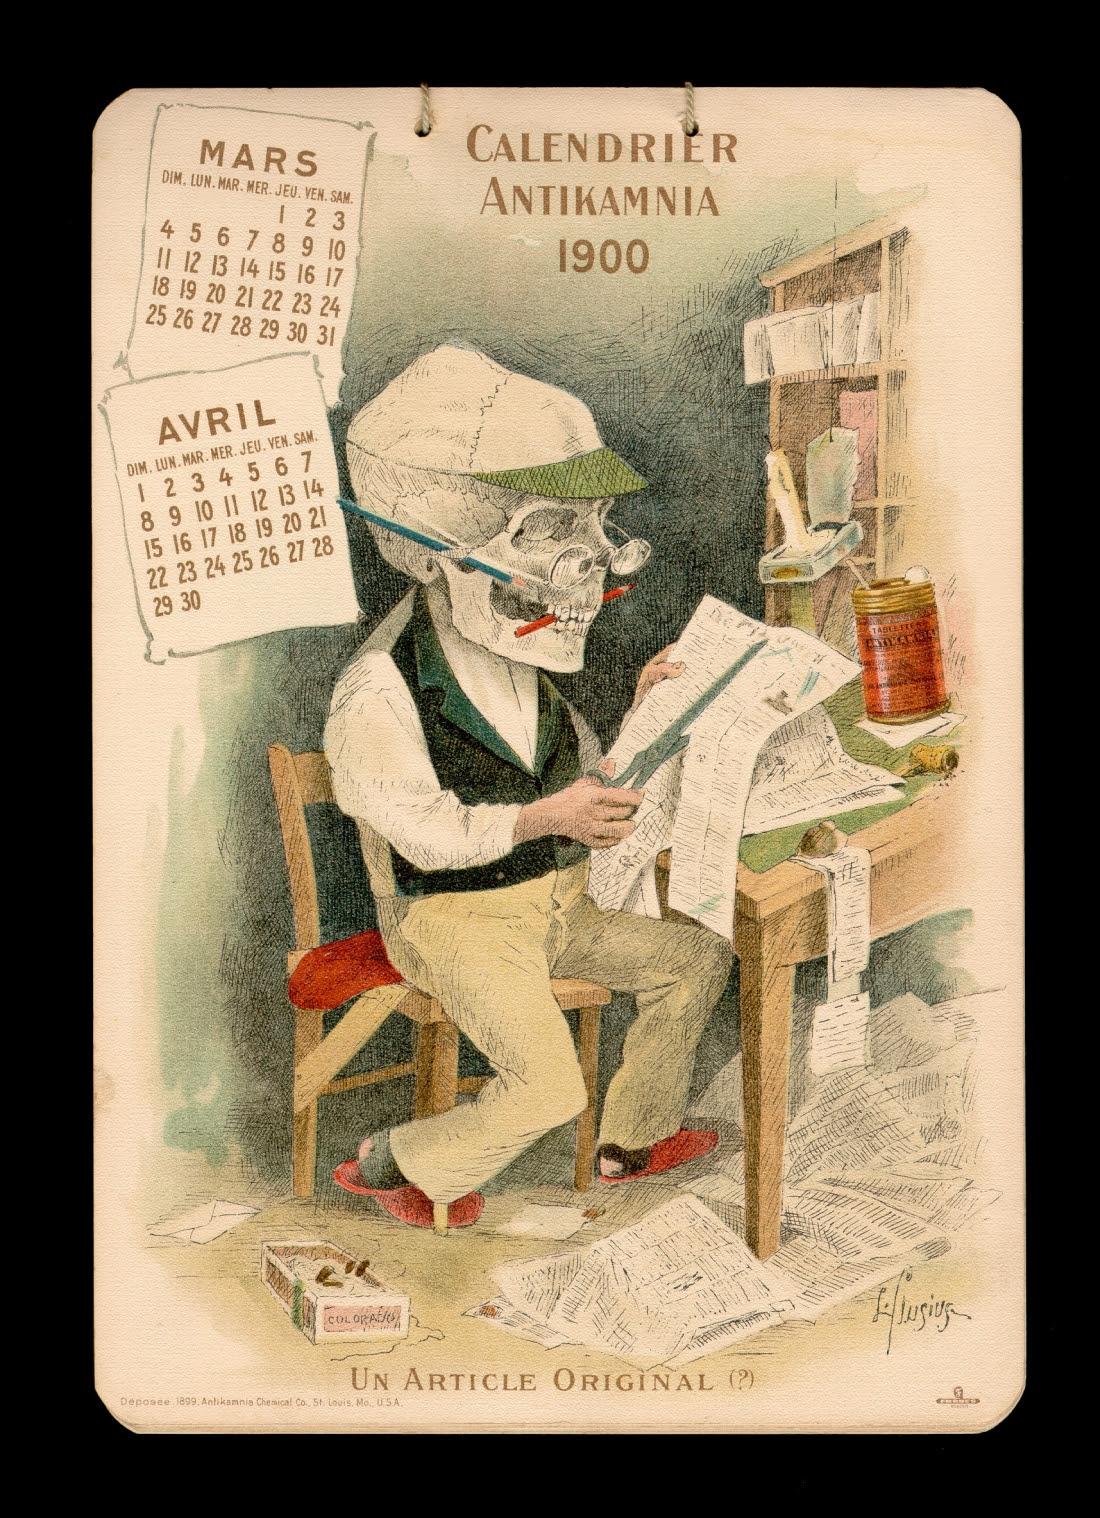 Antikamnia medical calendar 1900